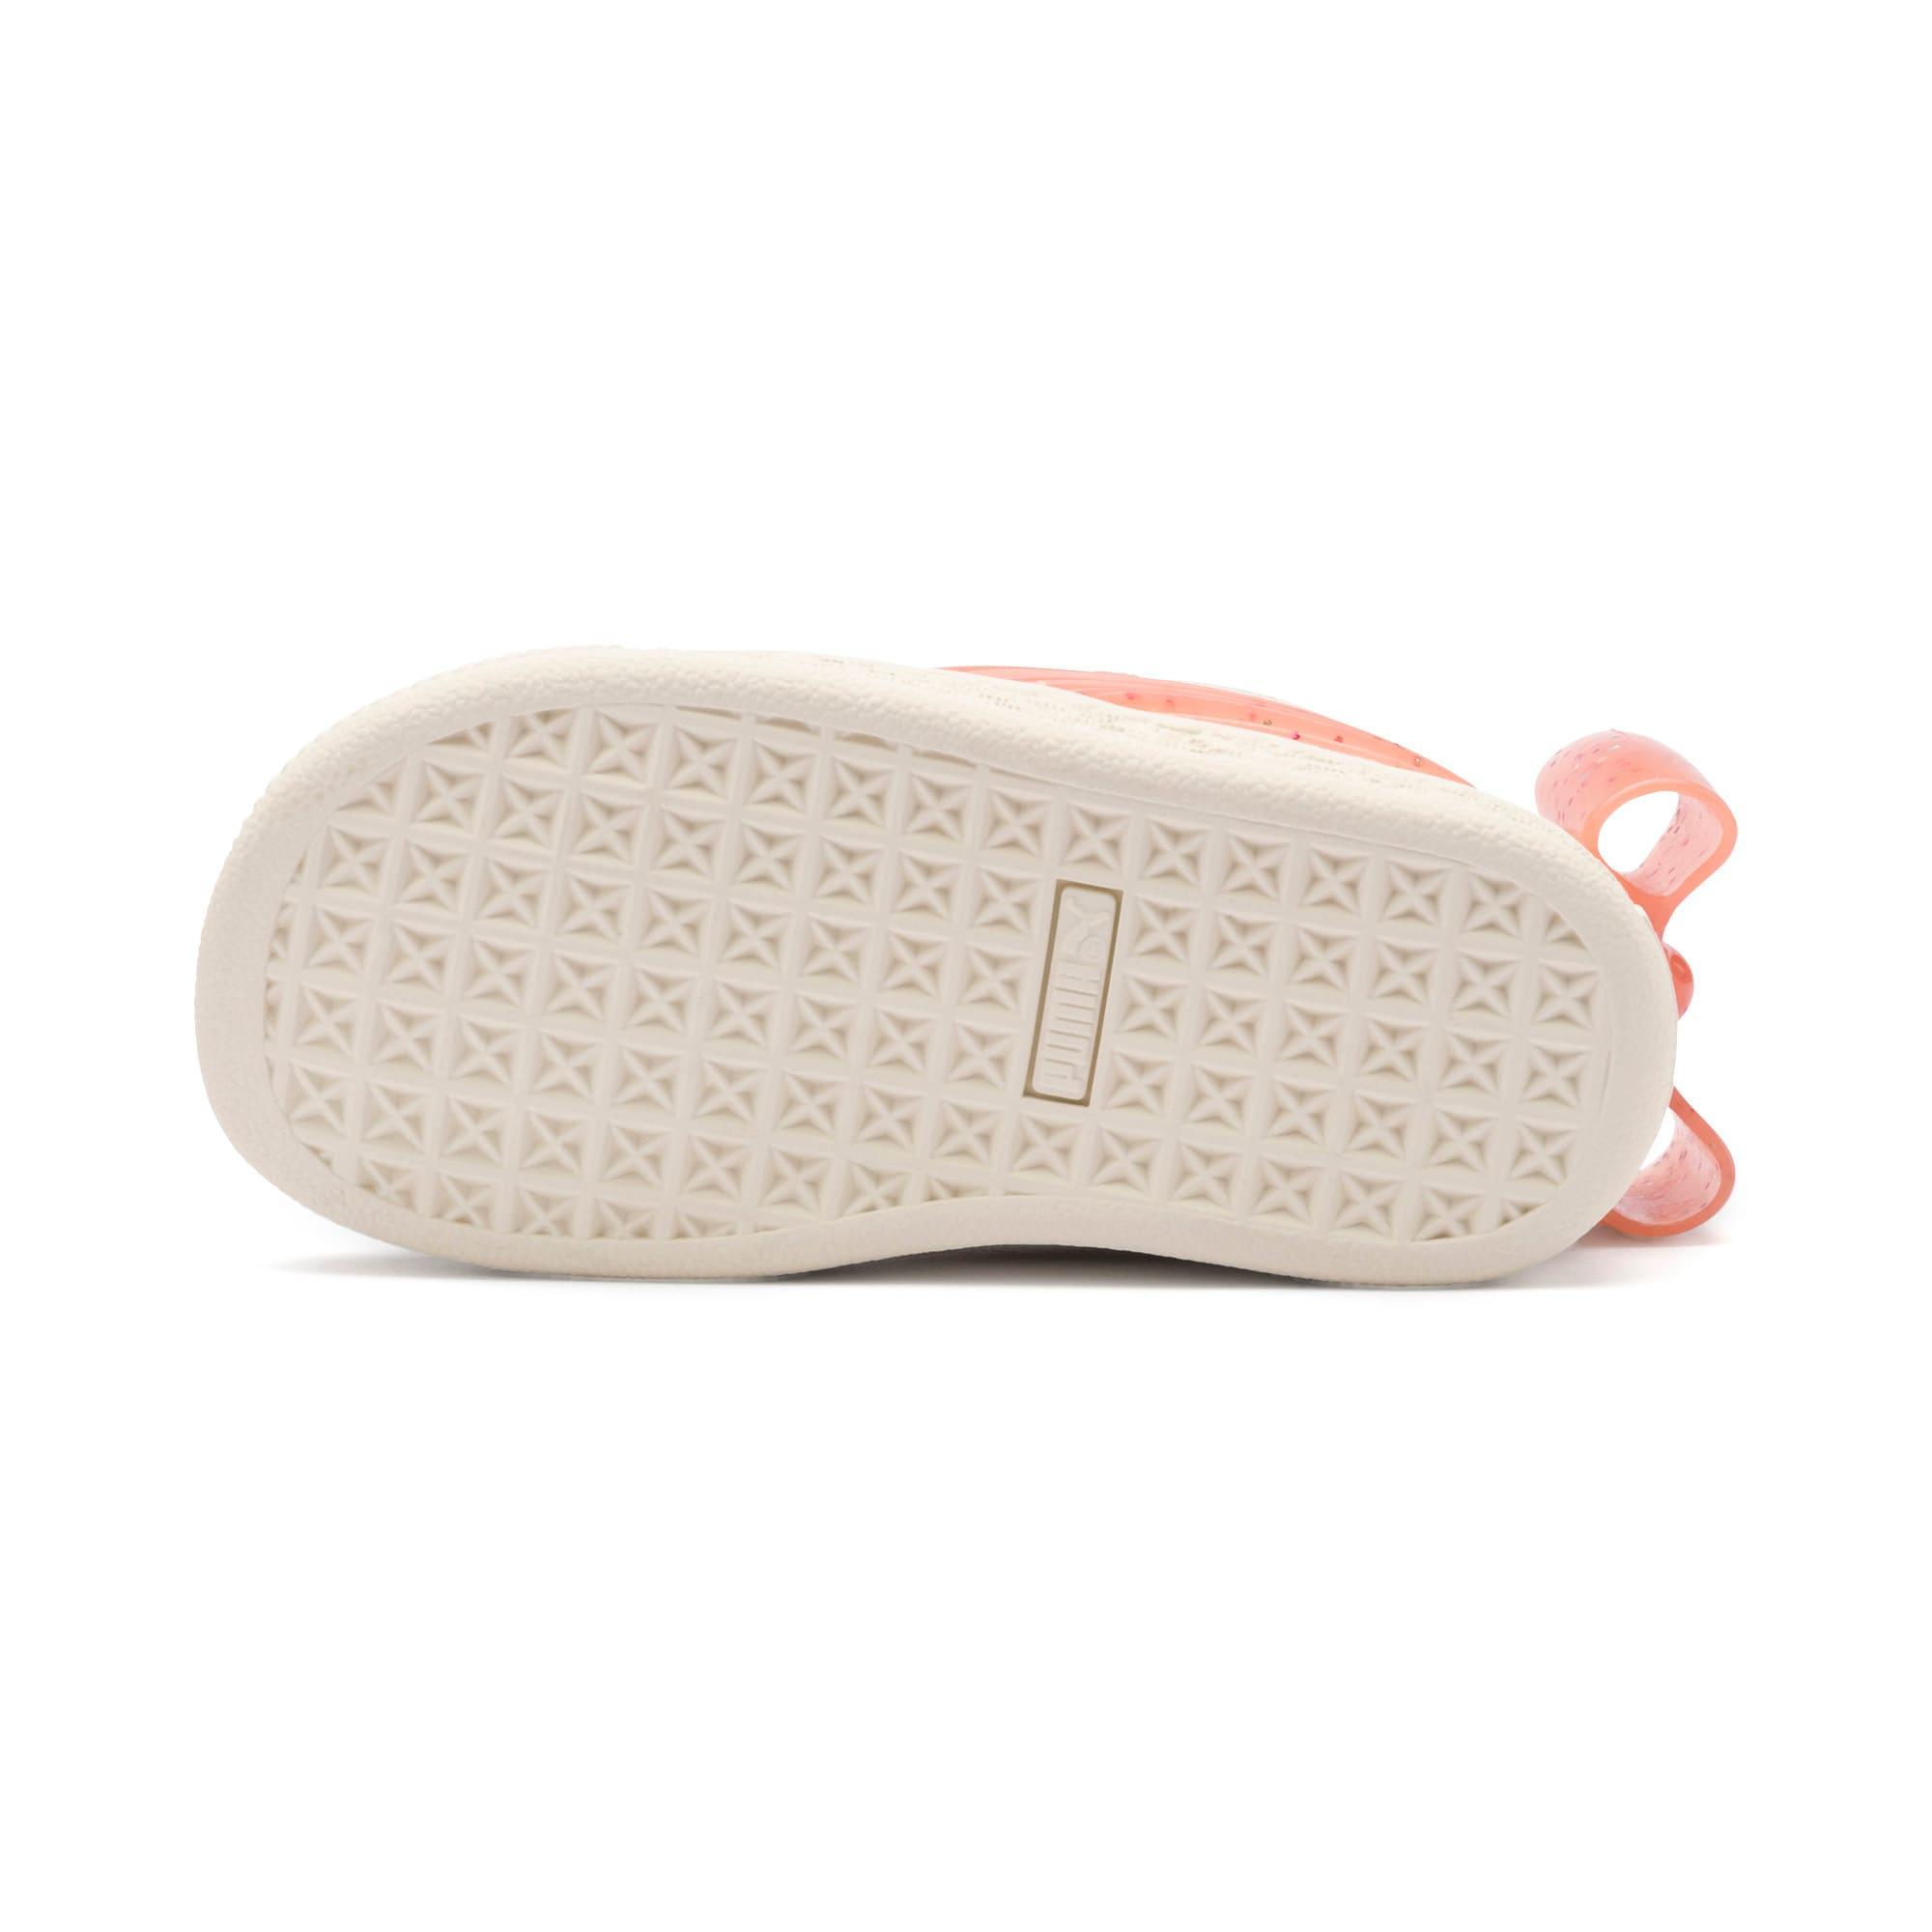 Miniatura 4 de Zapatos Suede Jelly Bow AC para niños, Whis White-Peach Bud-Silver, mediano